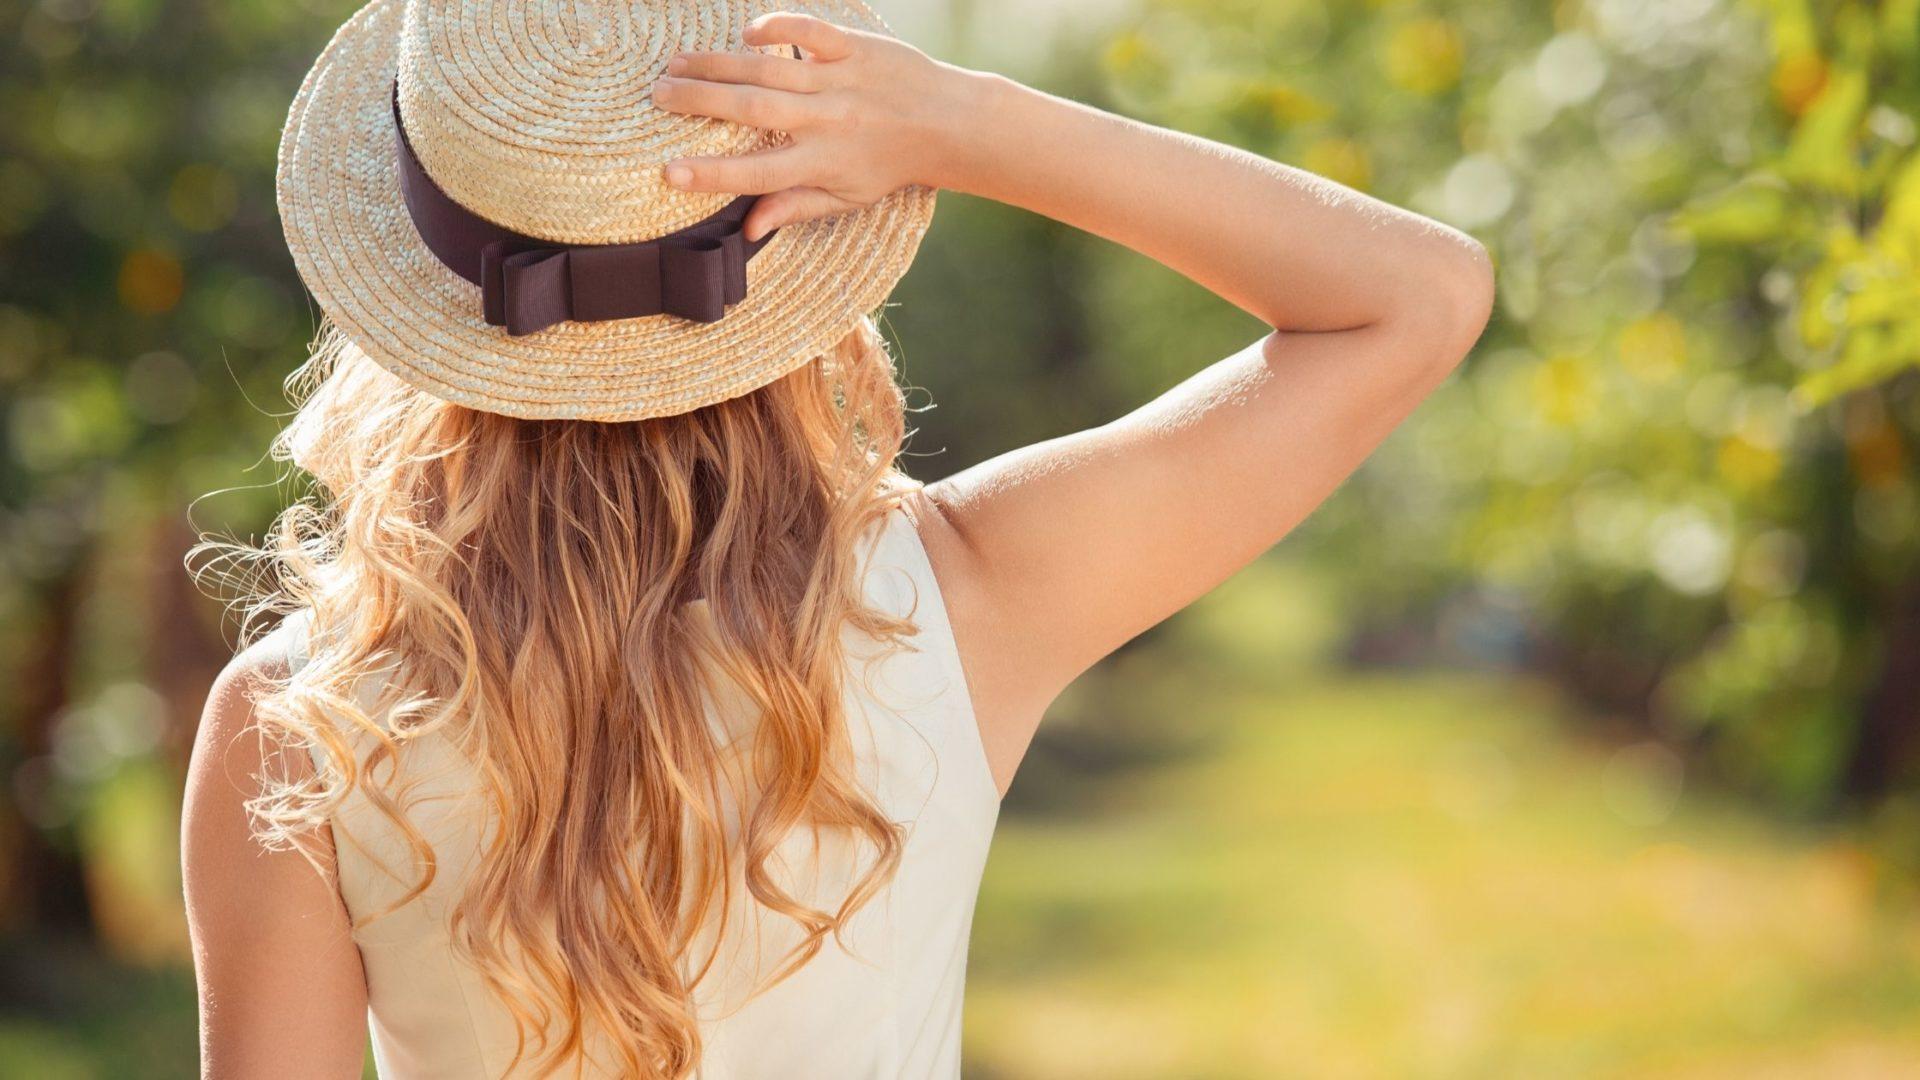 Summer Hair Problems Solved, Hoop Hair Salon in Clacton on Sea